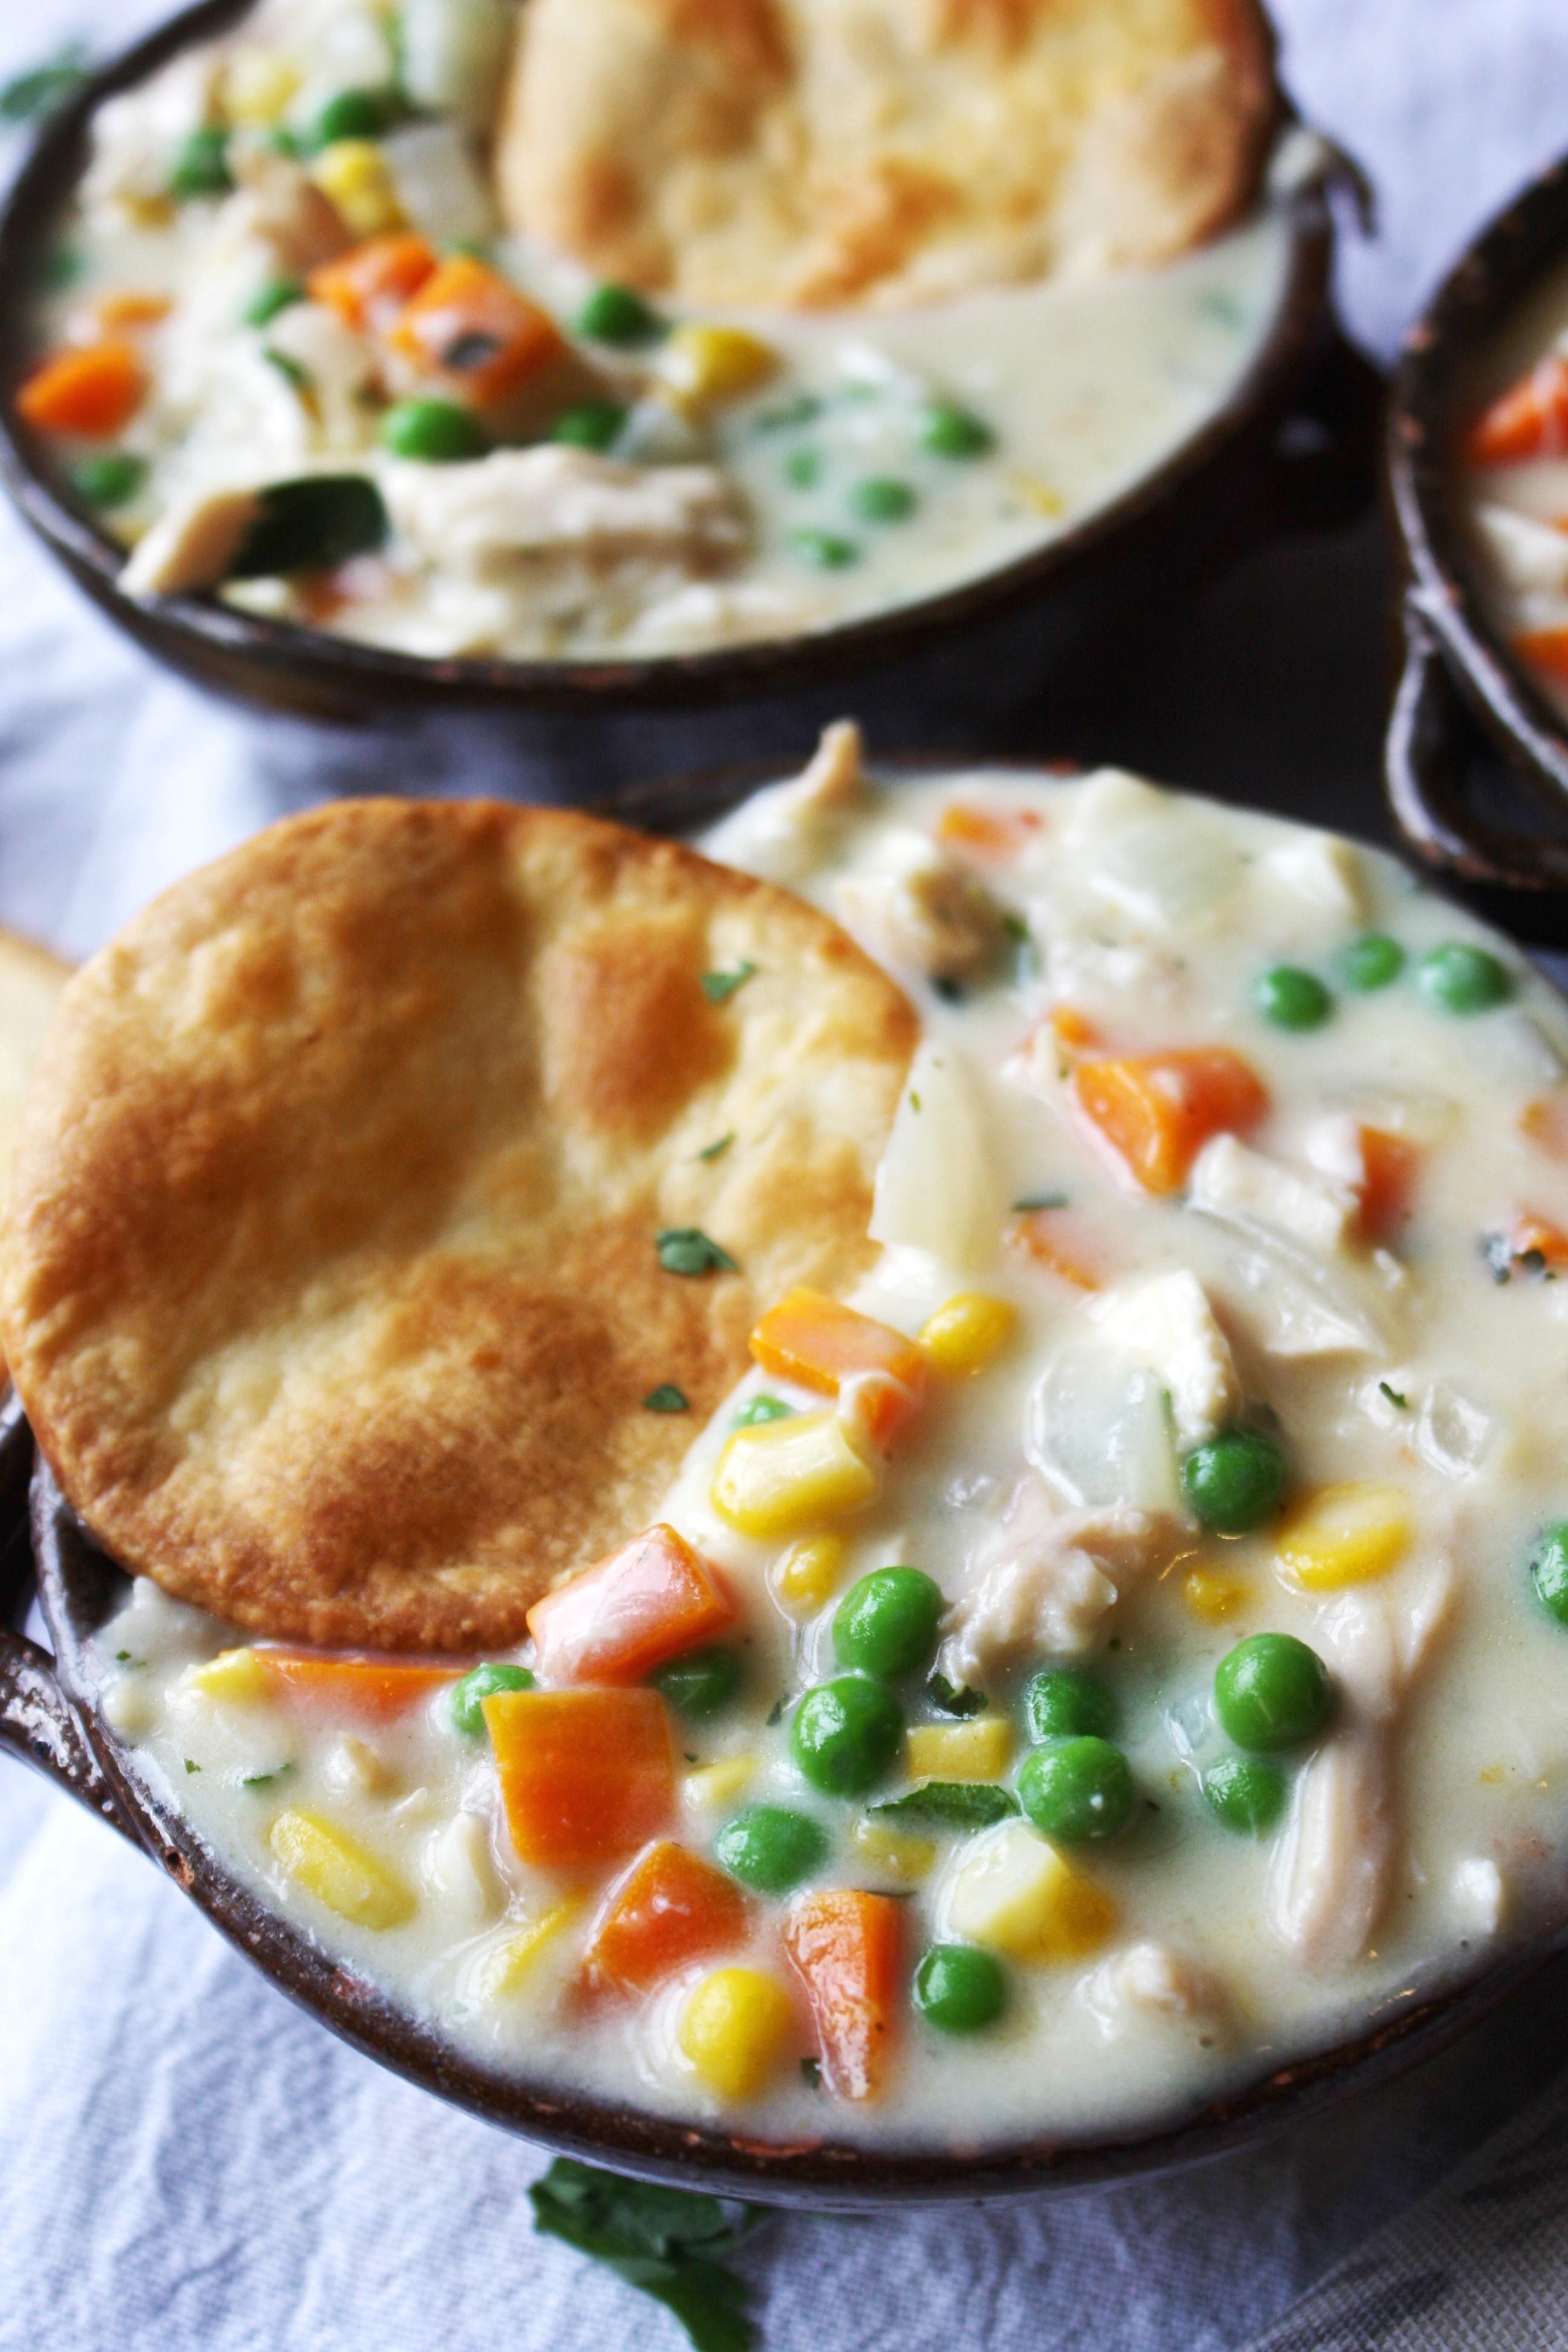 Chicken Pot Pie With Cream Of Chicken Soup  easy chicken pot pie recipe with pie crust and cream of